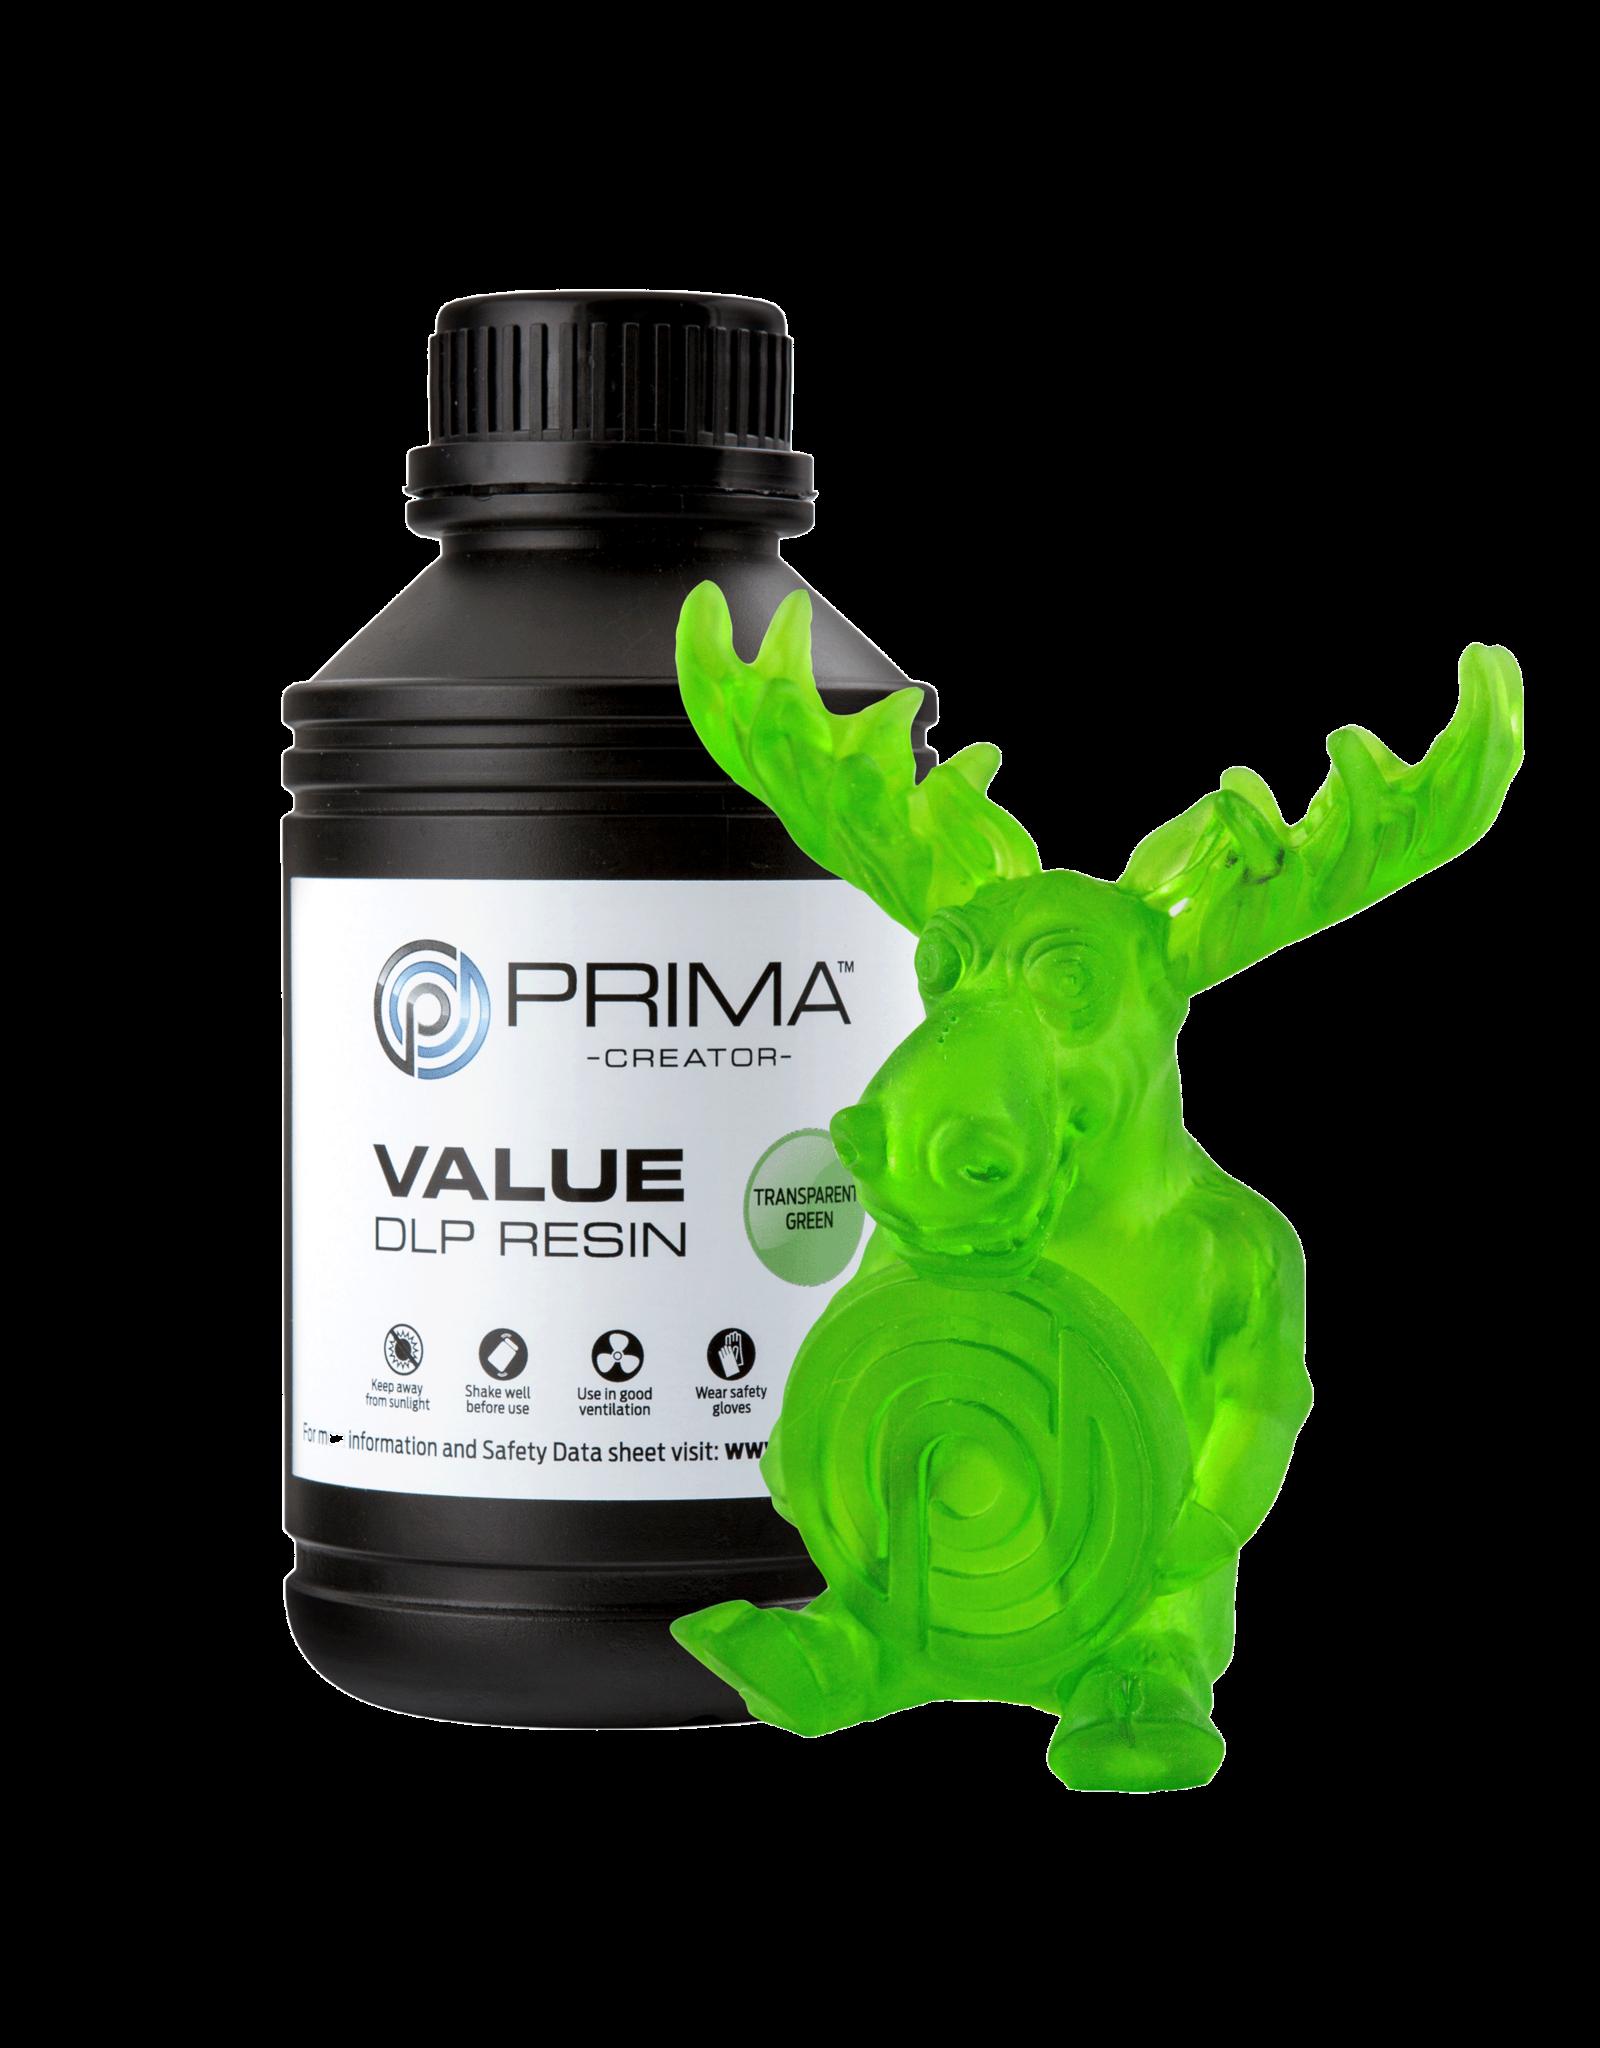 Prima PrimaCreator Value UV / DLP Resin vert transparent